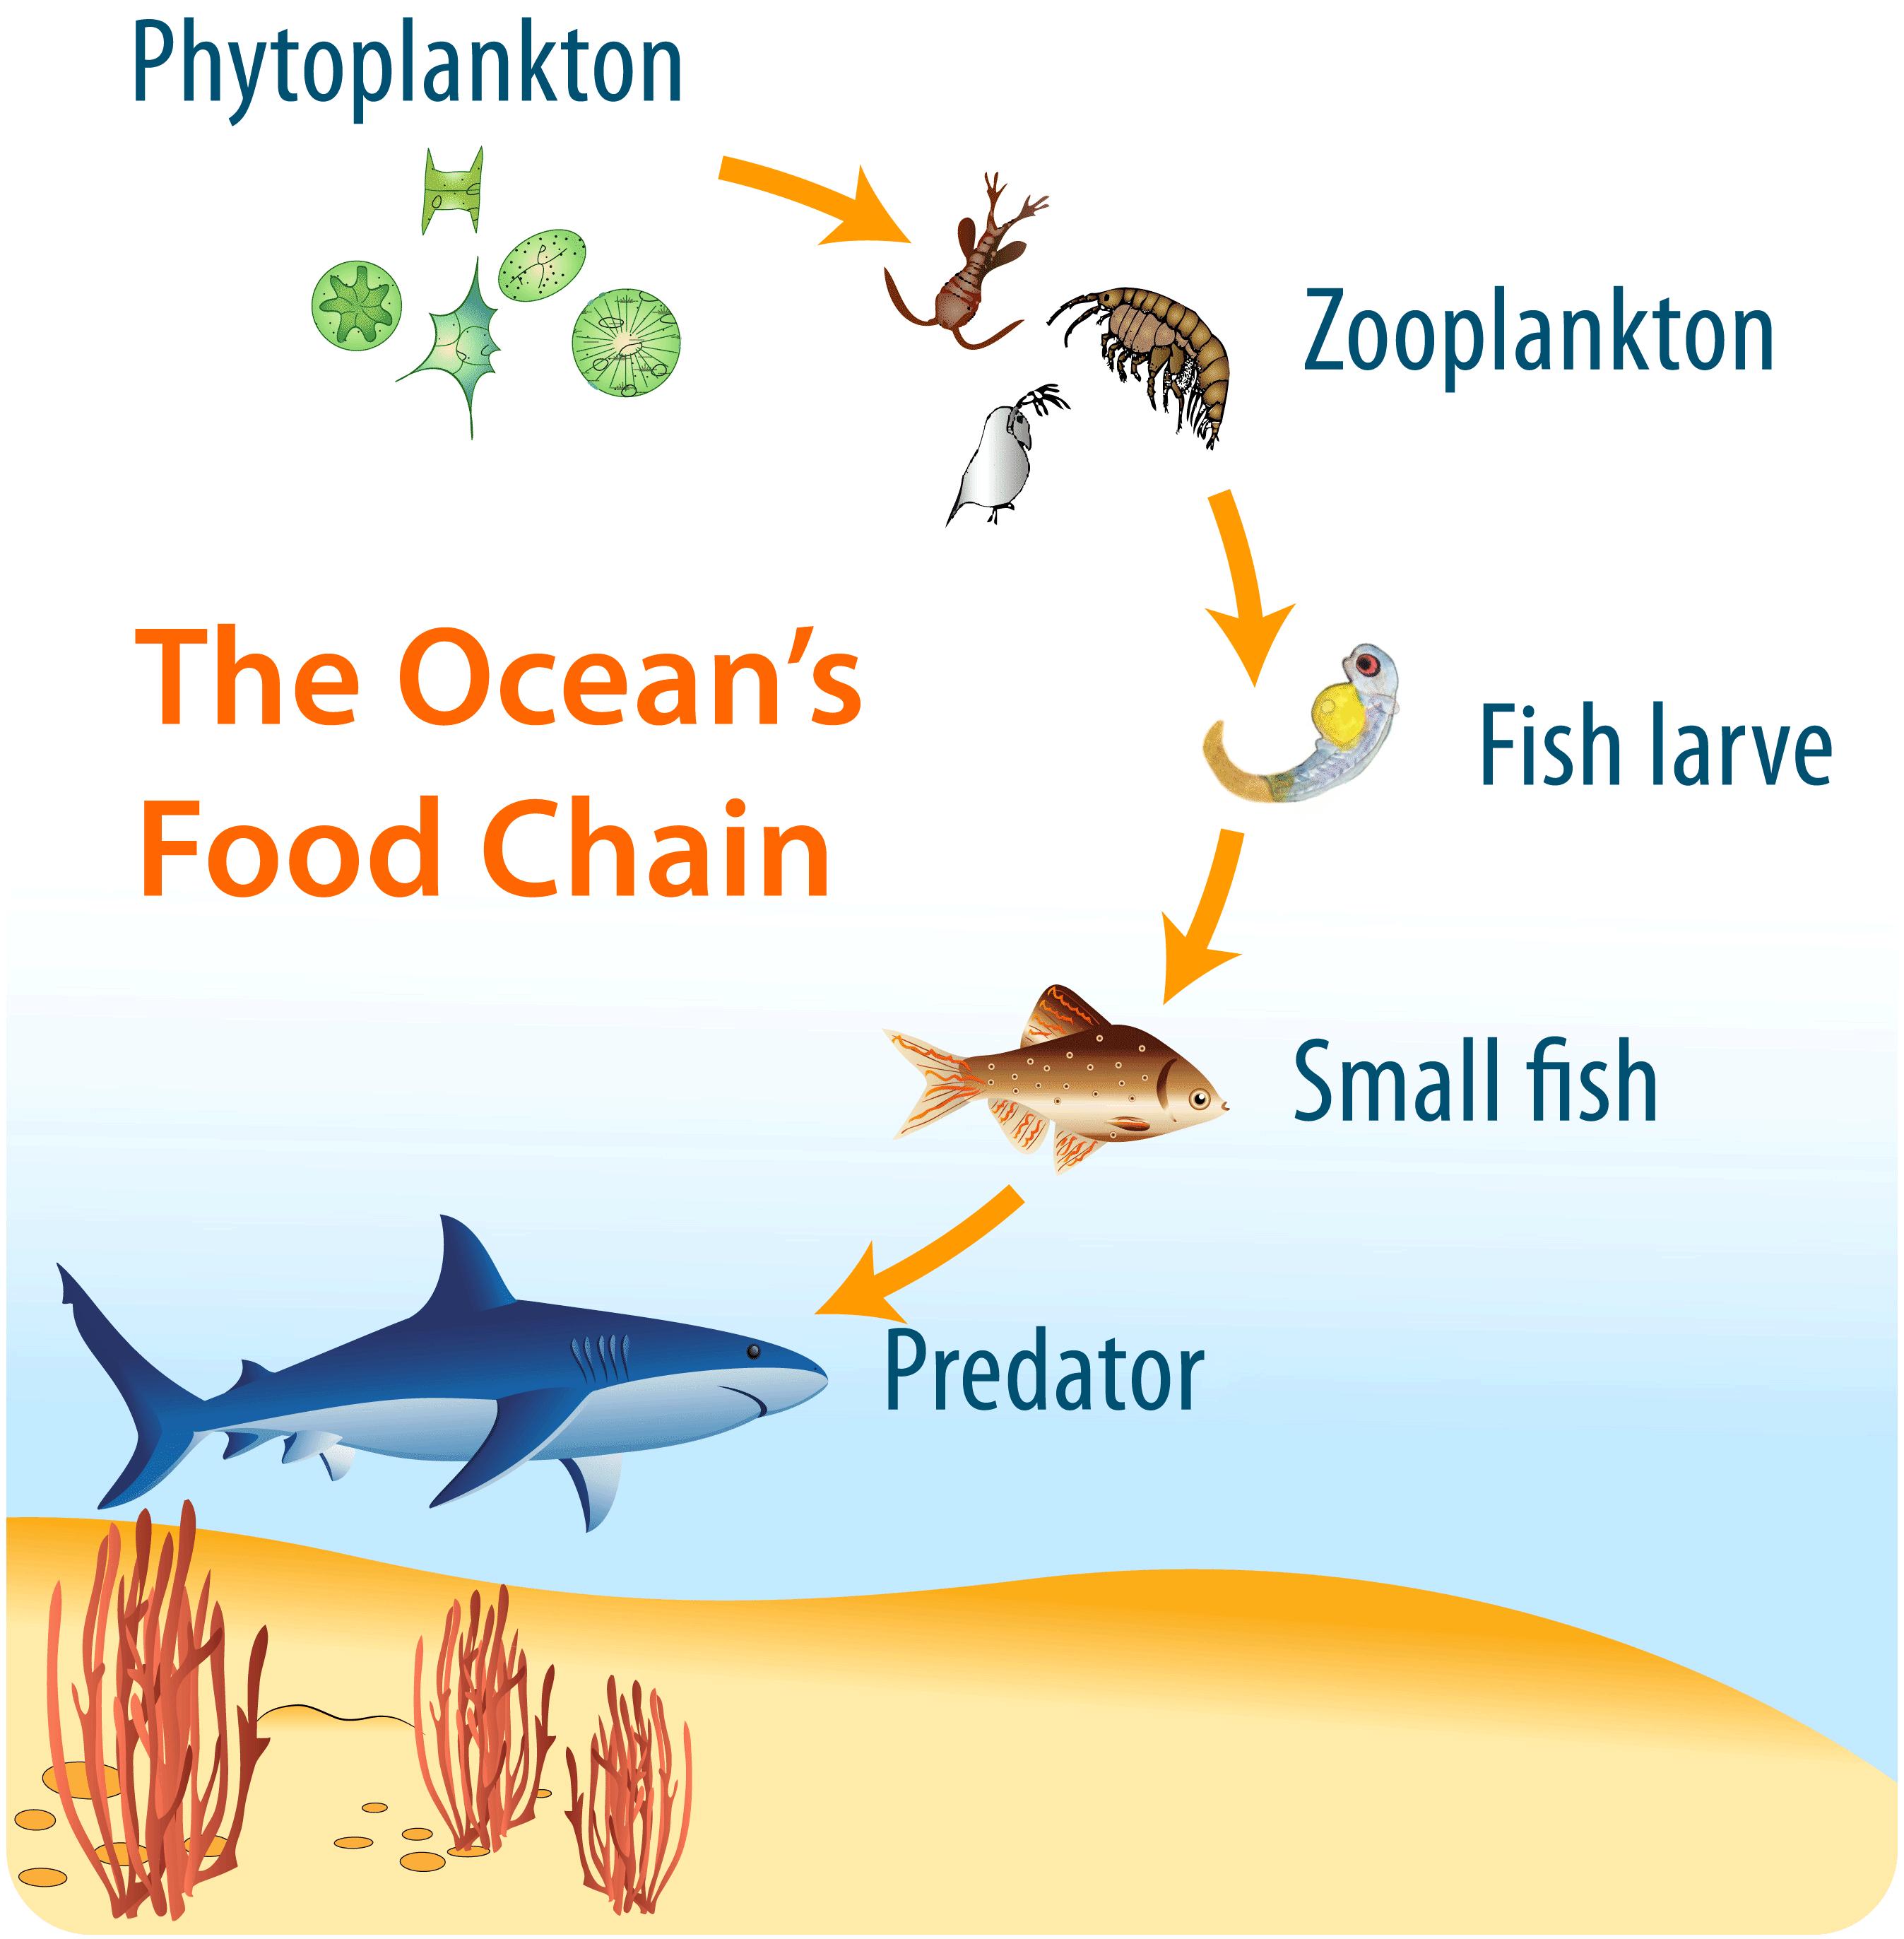 Ocean Life | CK-12 Foundation